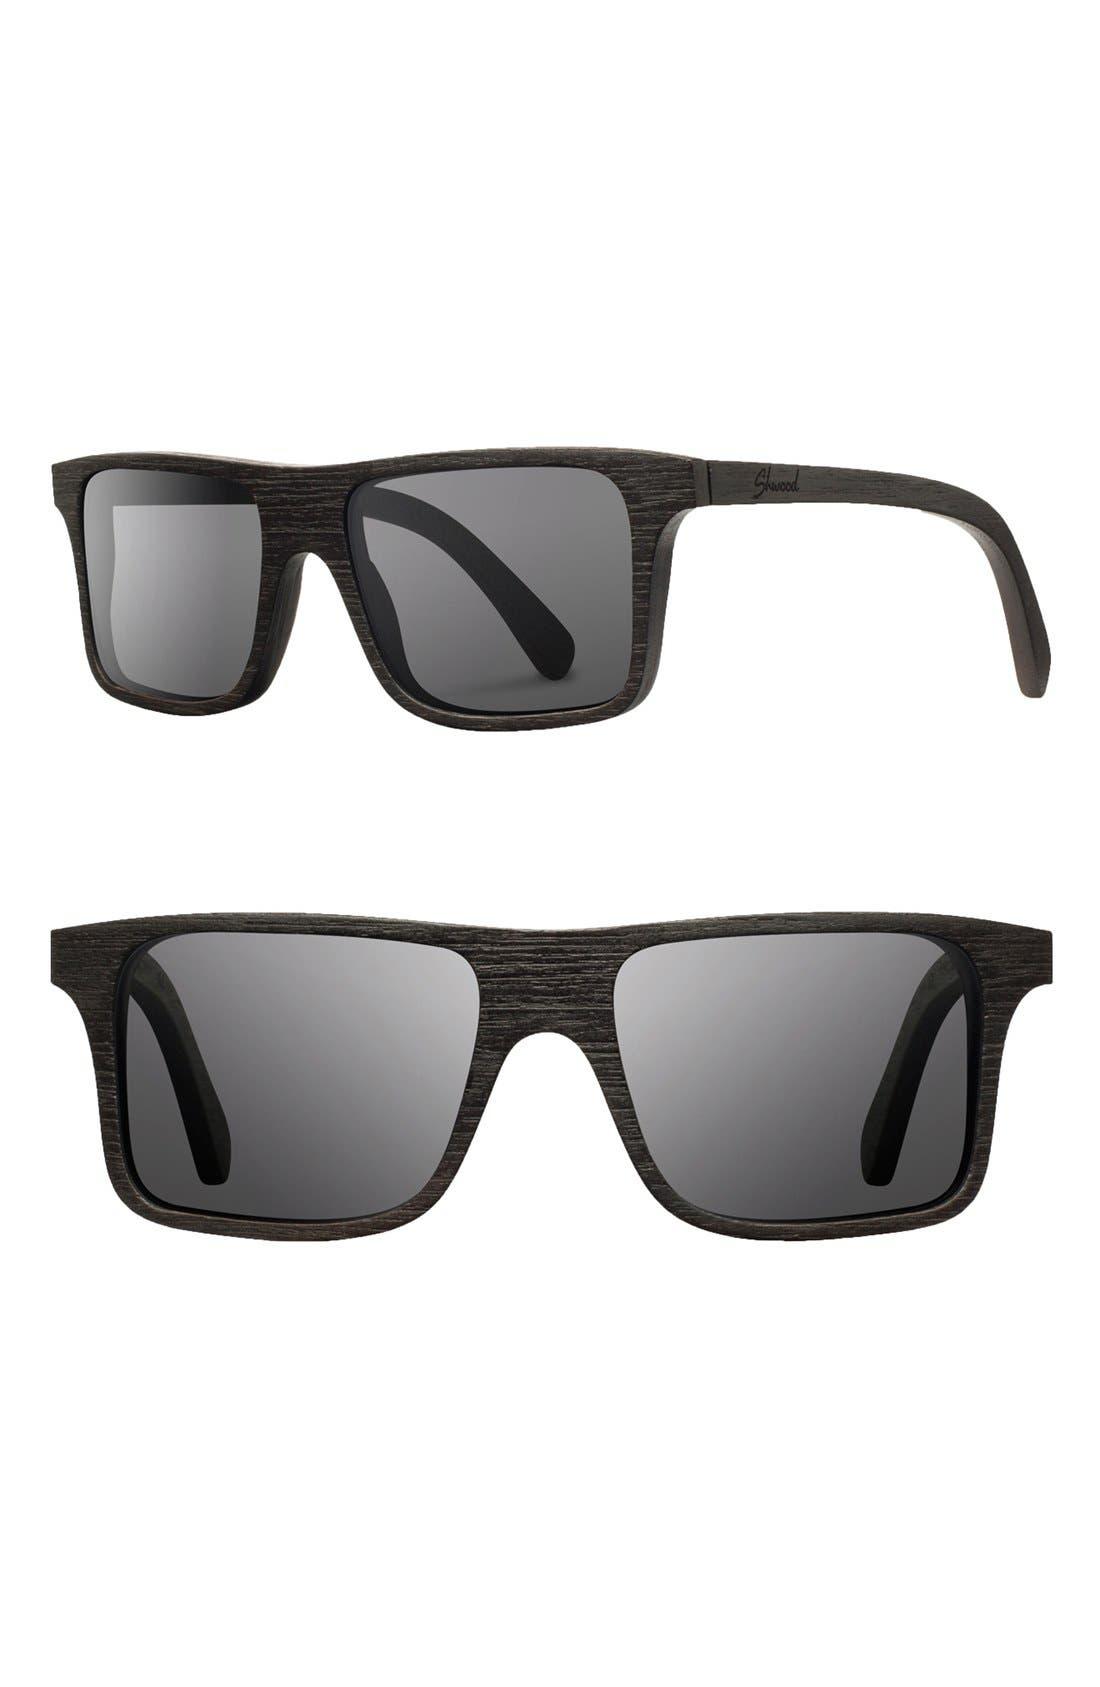 Main Image - Shwood 'Govy' 53mm Sunglasses